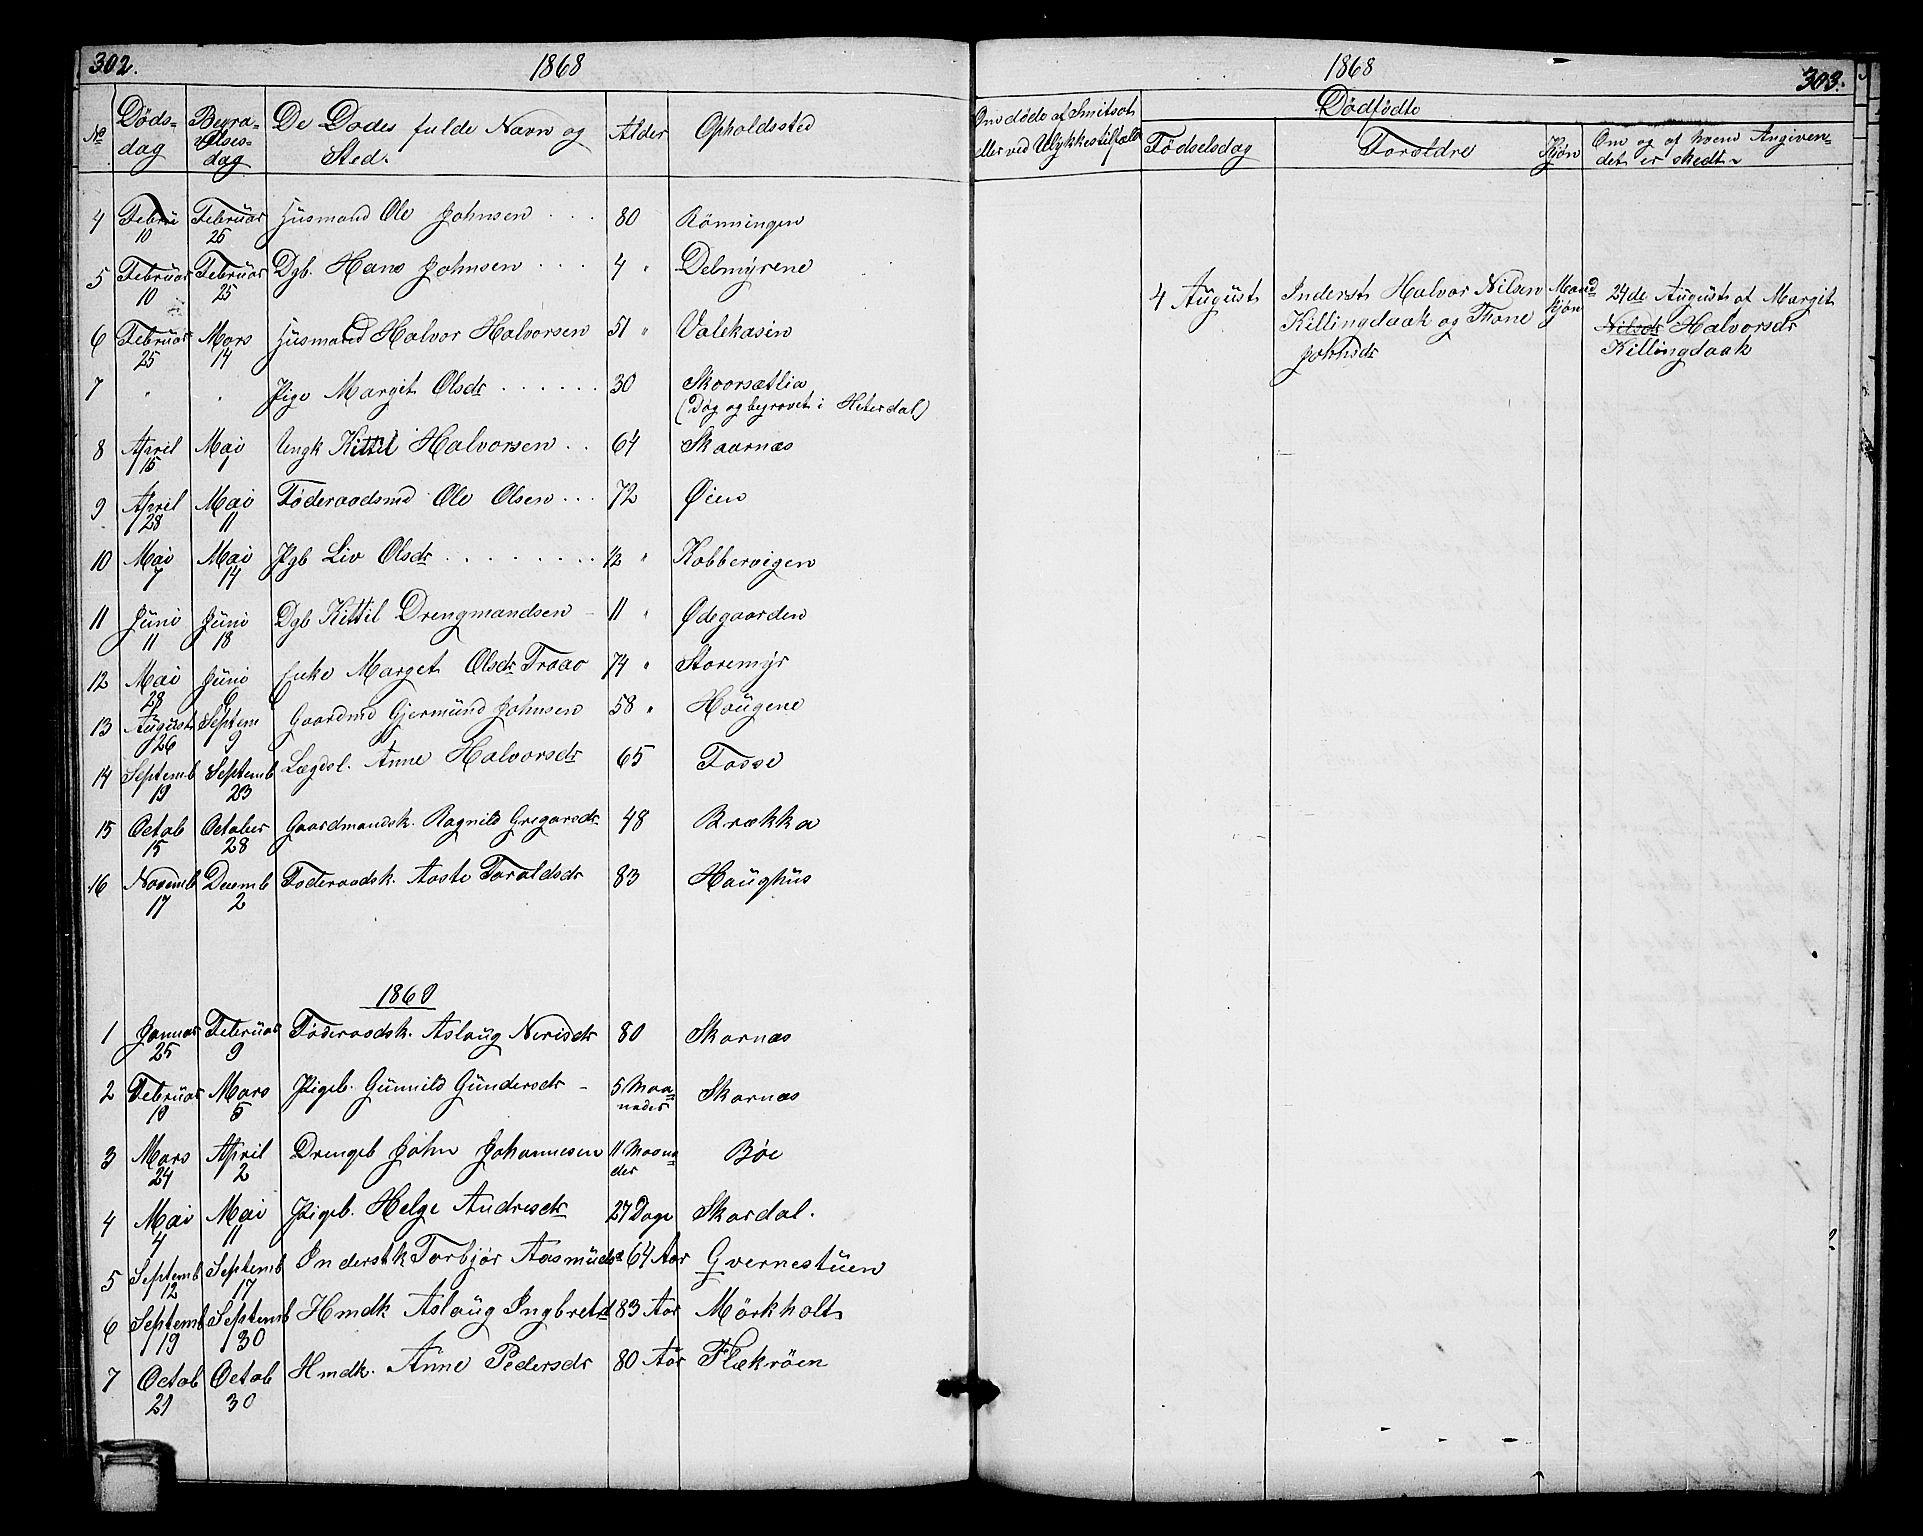 SAKO, Hjartdal kirkebøker, G/Gb/L0002: Klokkerbok nr. II 2, 1854-1884, s. 302-303